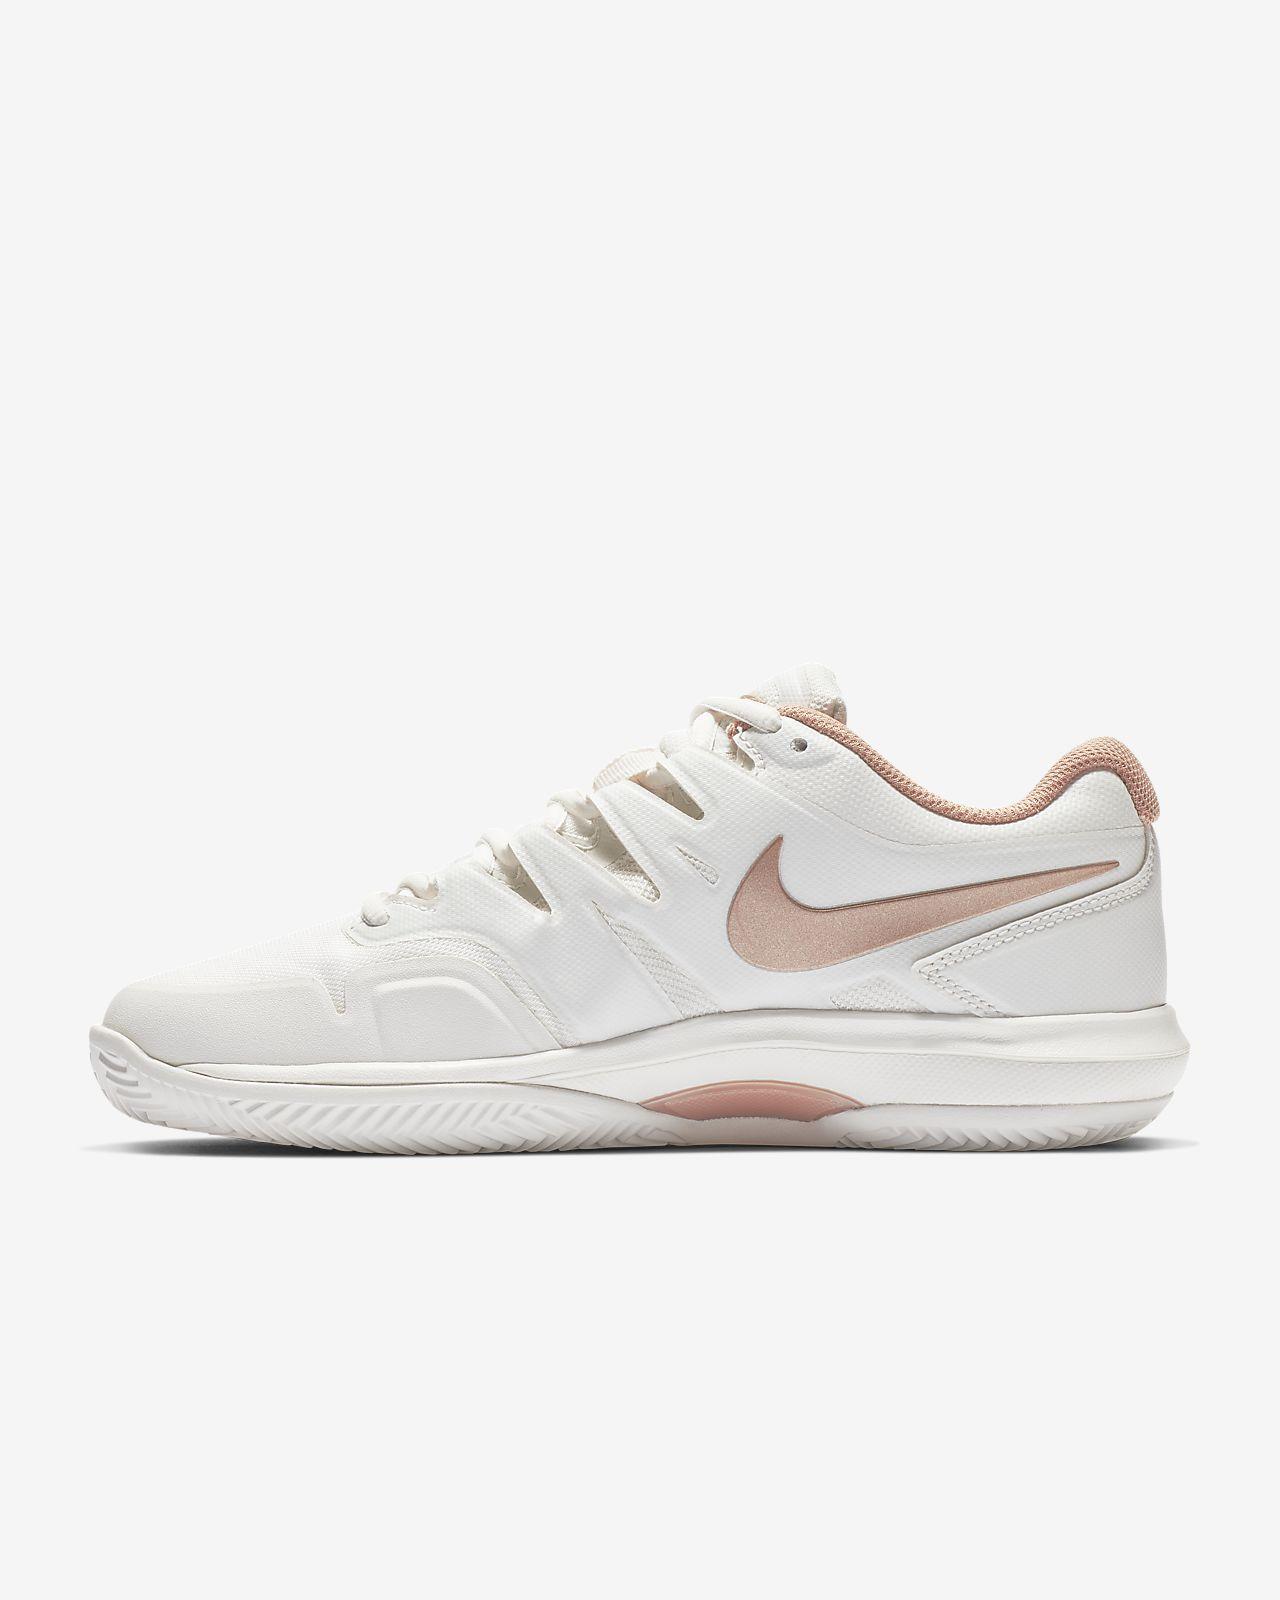 Nike Air Zoom Prestige Clay-tennissko til kvinder